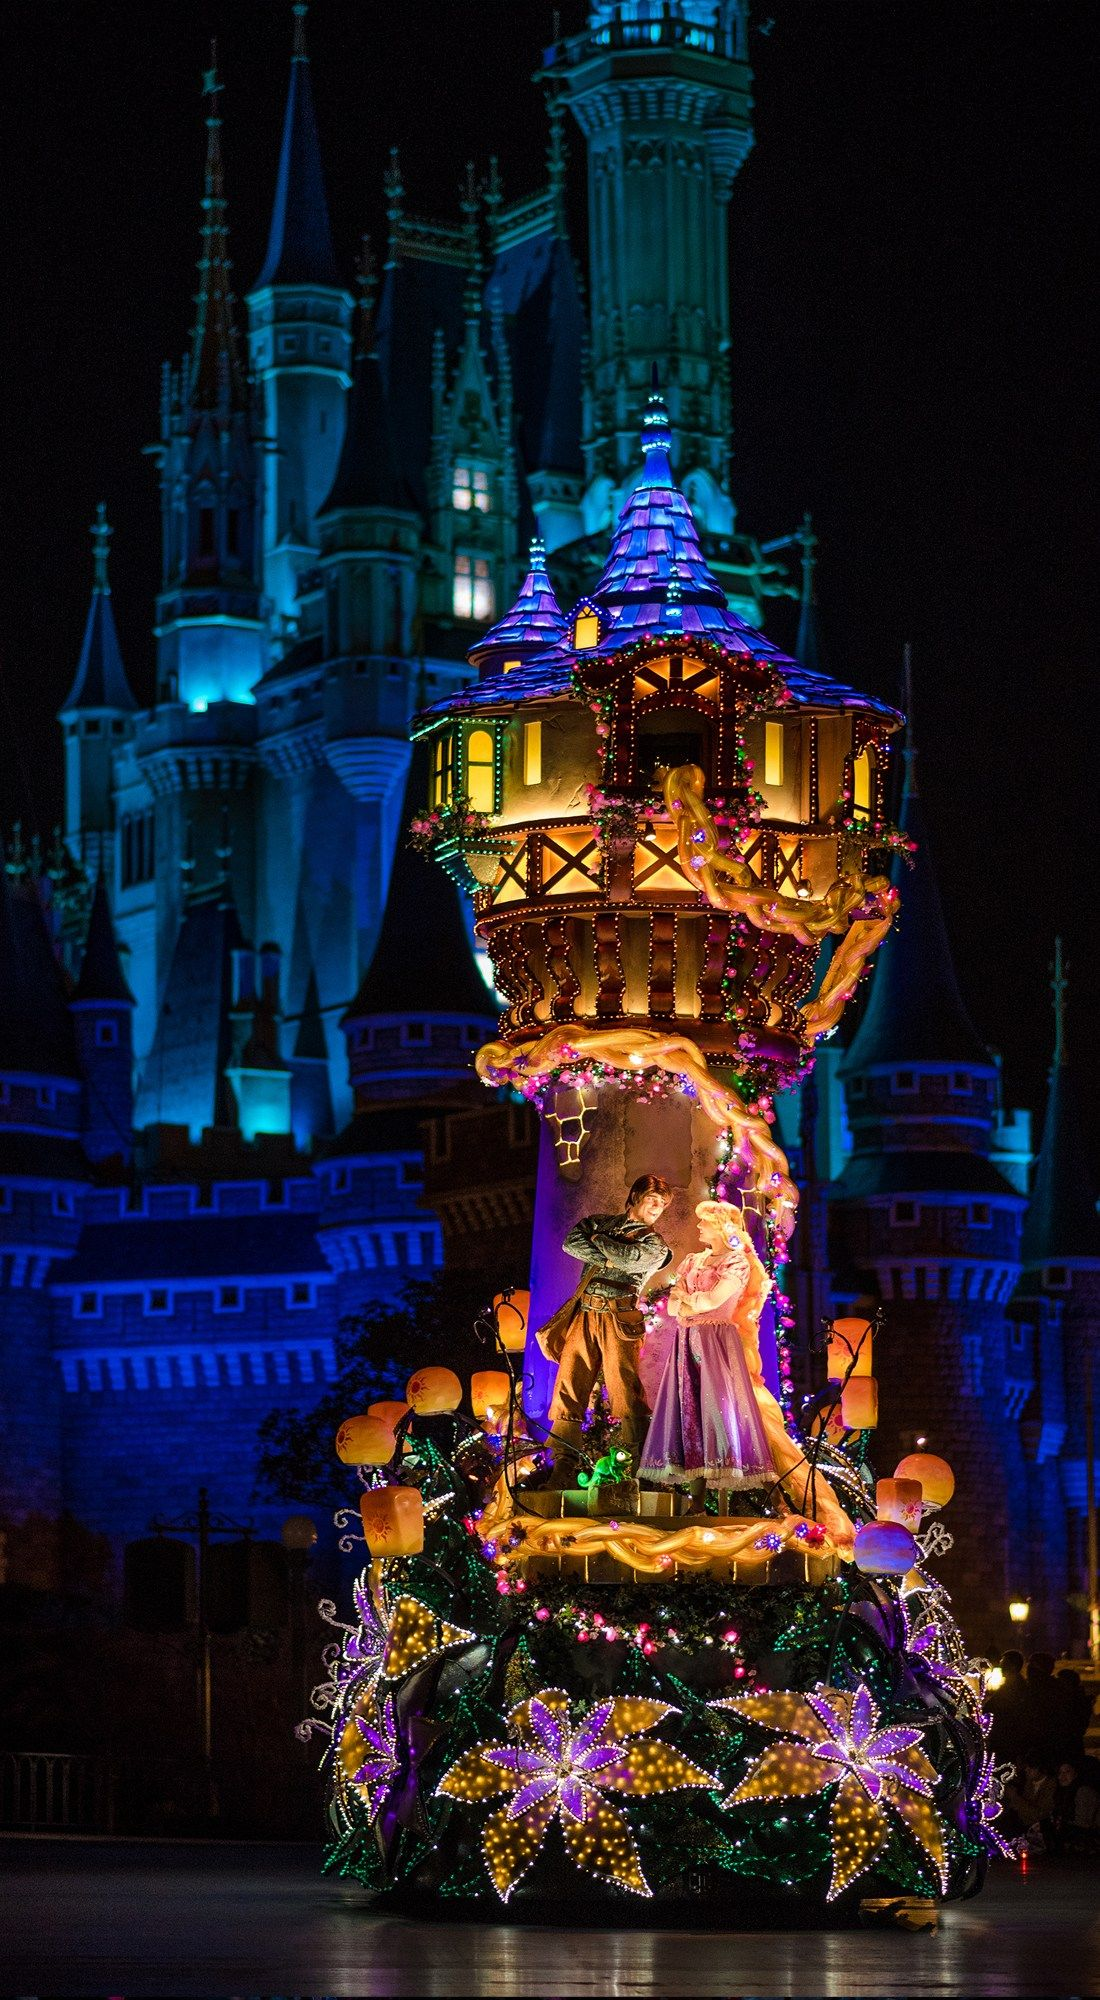 Disney Christmas Iphone Wallpapers Top Free Disney Christmas Iphone Backgrounds Wallpaperaccess